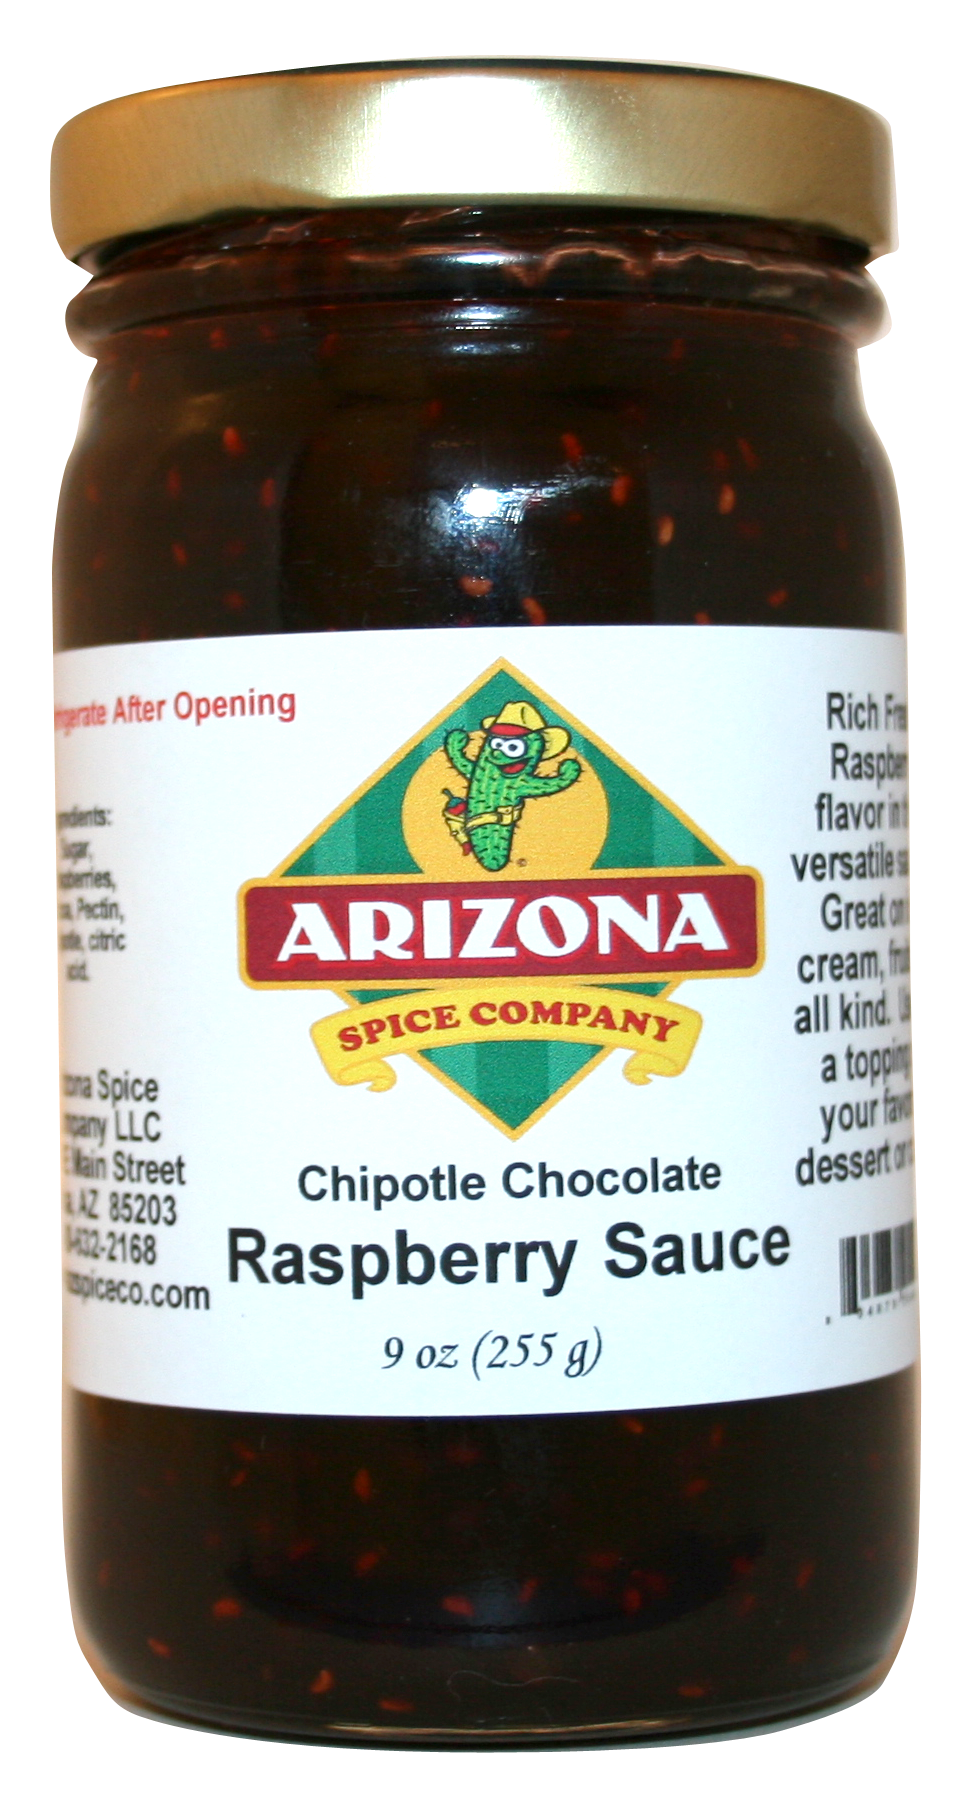 Arizona Salsa and Spice Co image 20